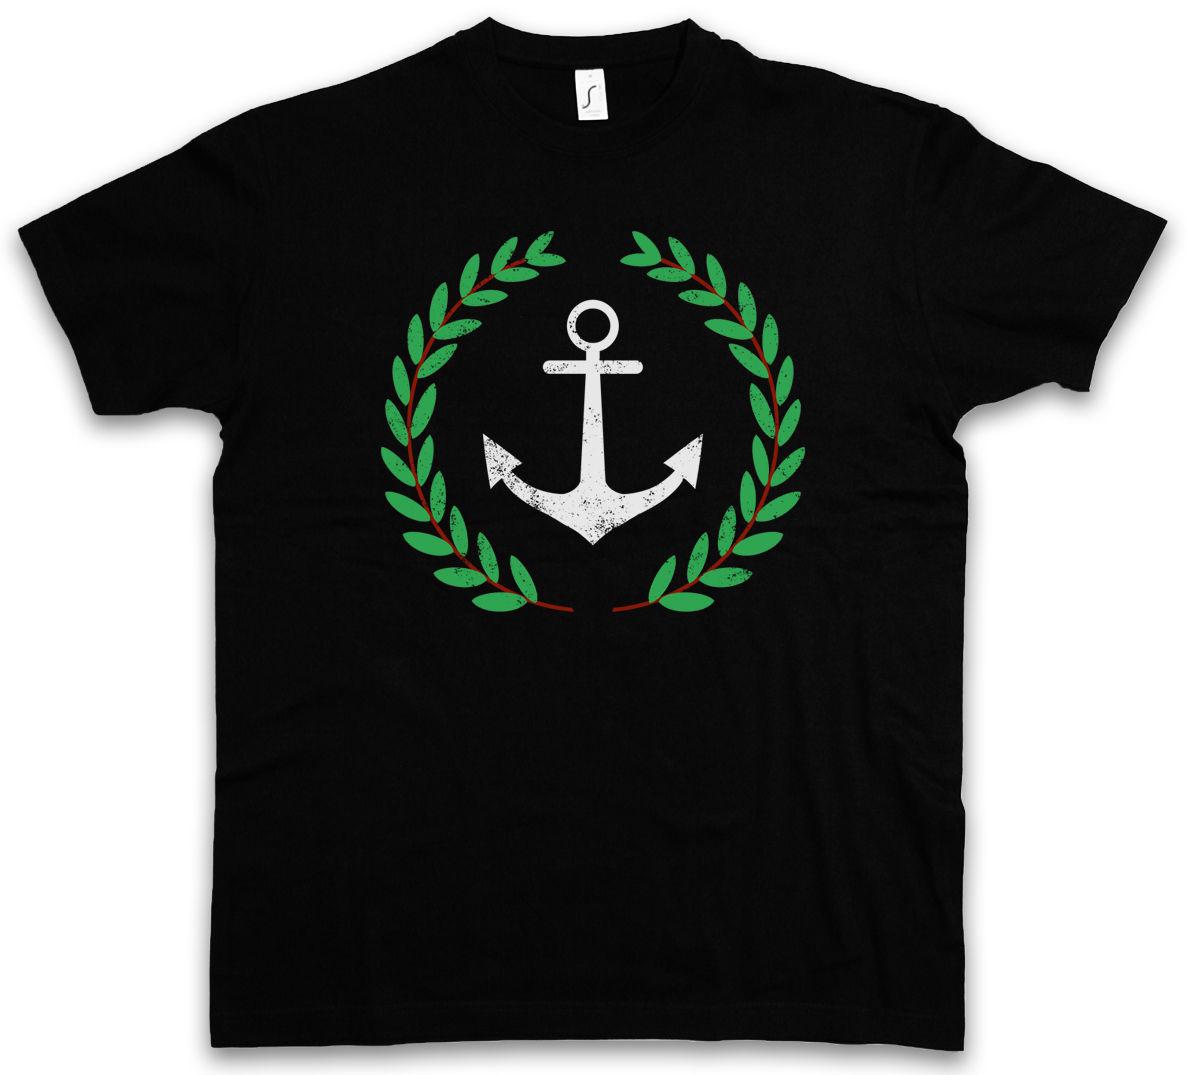 ANCHOR AND WREATH T-SHIRT Pablo TV Series Escobar Narcos Harajuku Tops Fashion Classic Unique t-Shirt gift free shipping